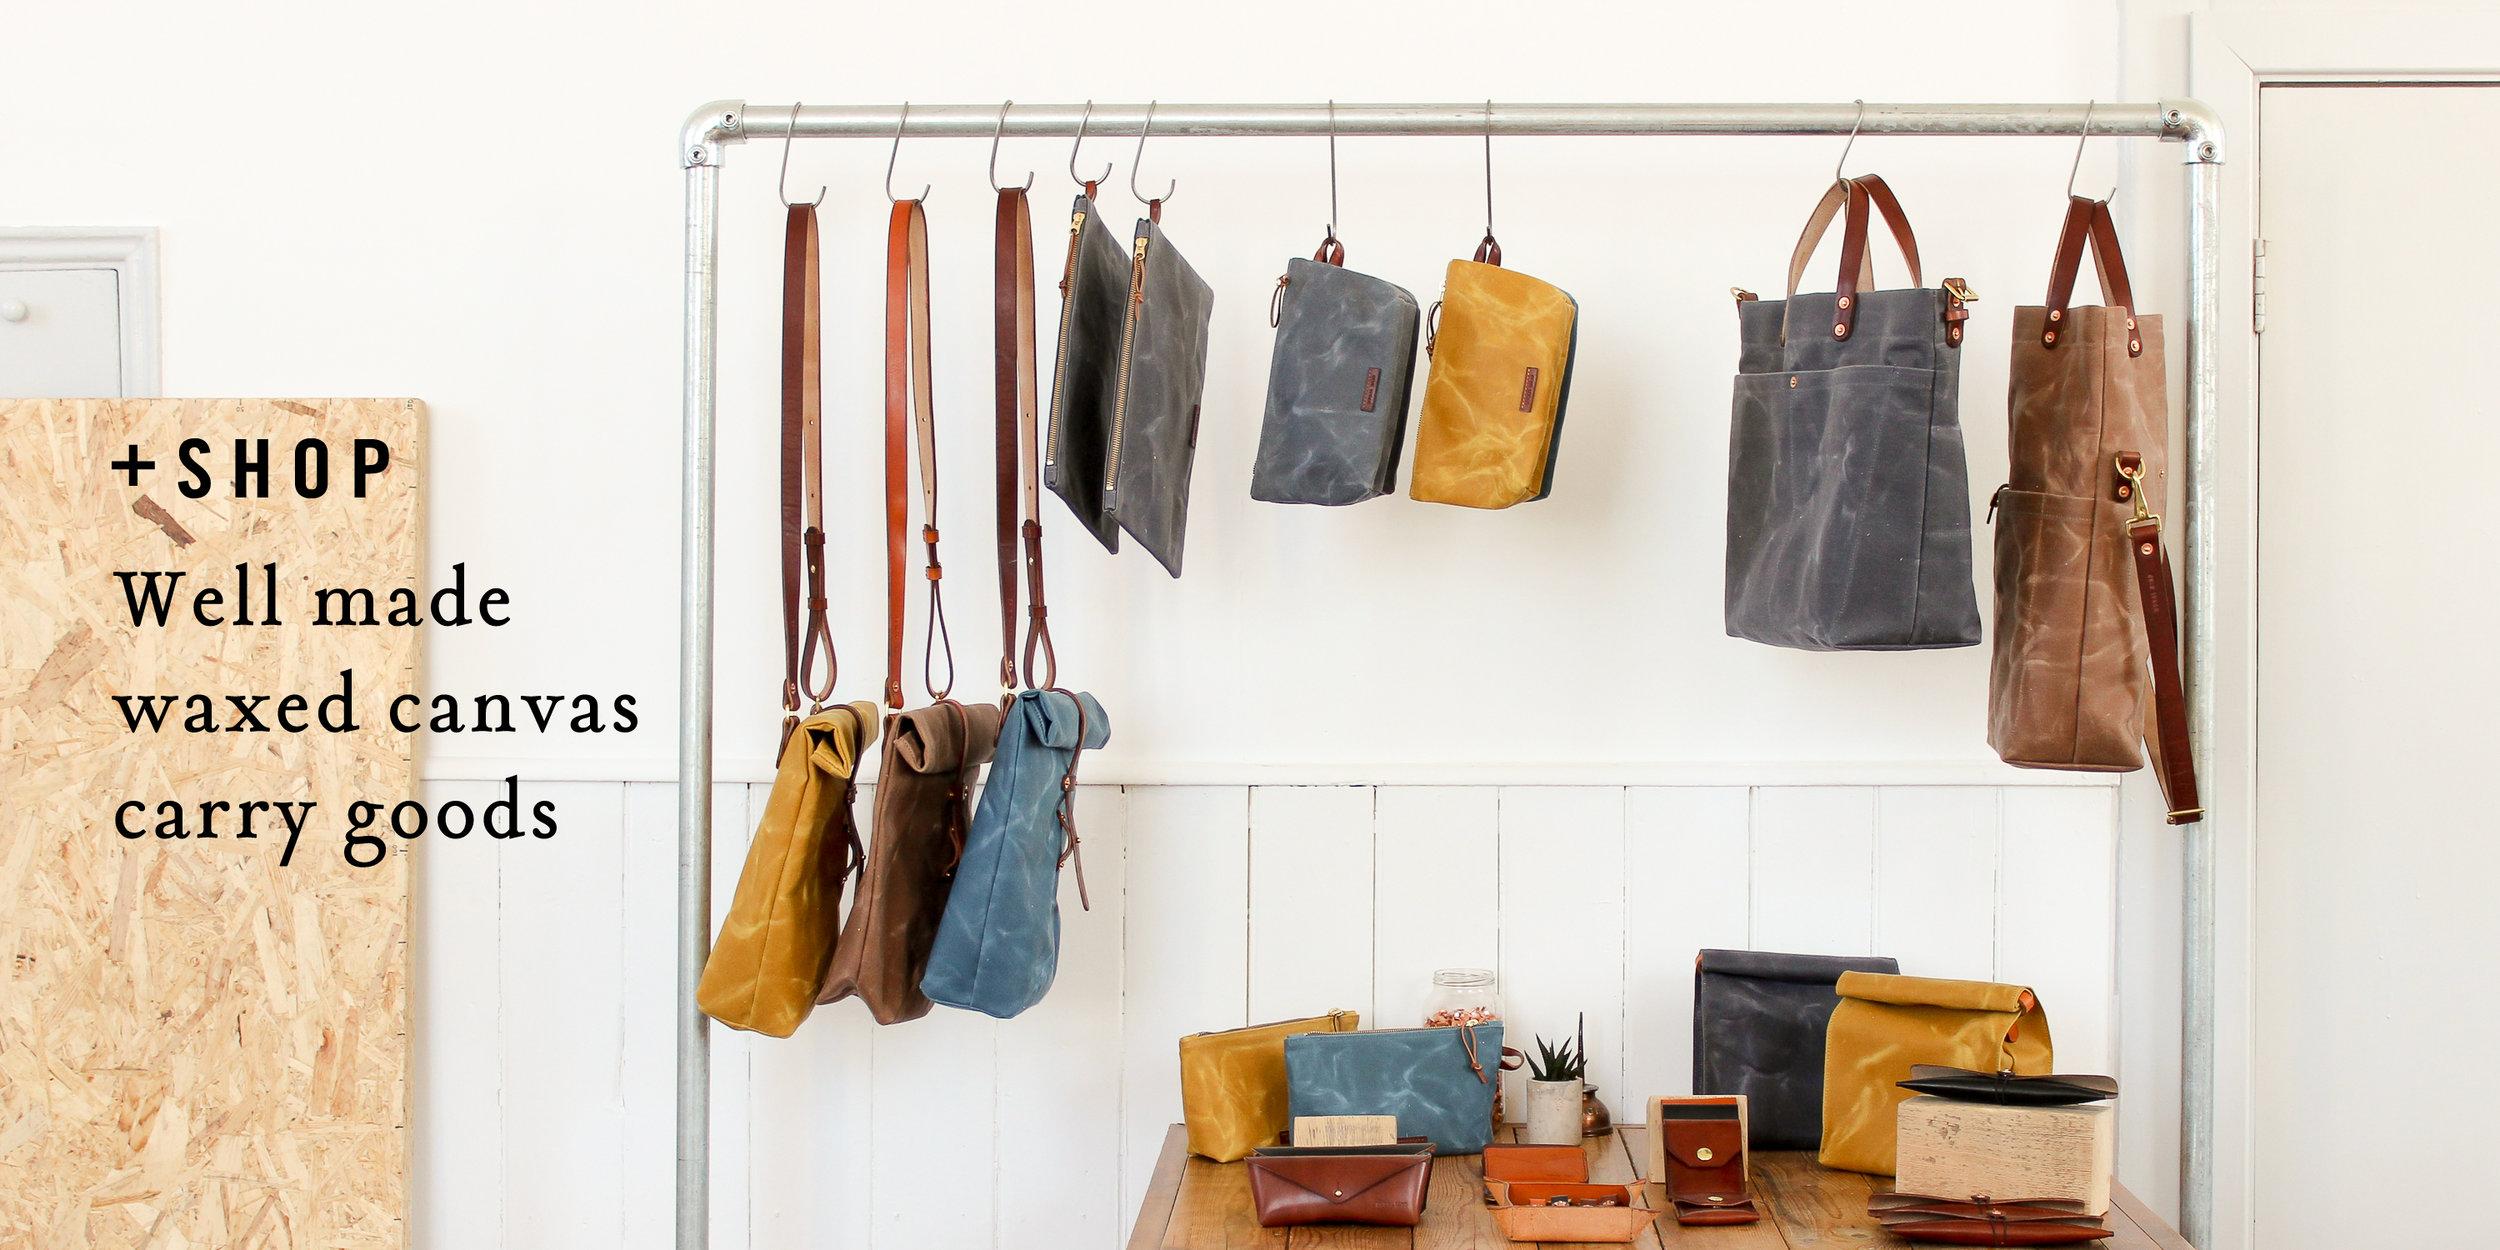 Rural-Kind-Handmade-Bags-UK-Waxed-Canvas.jpg